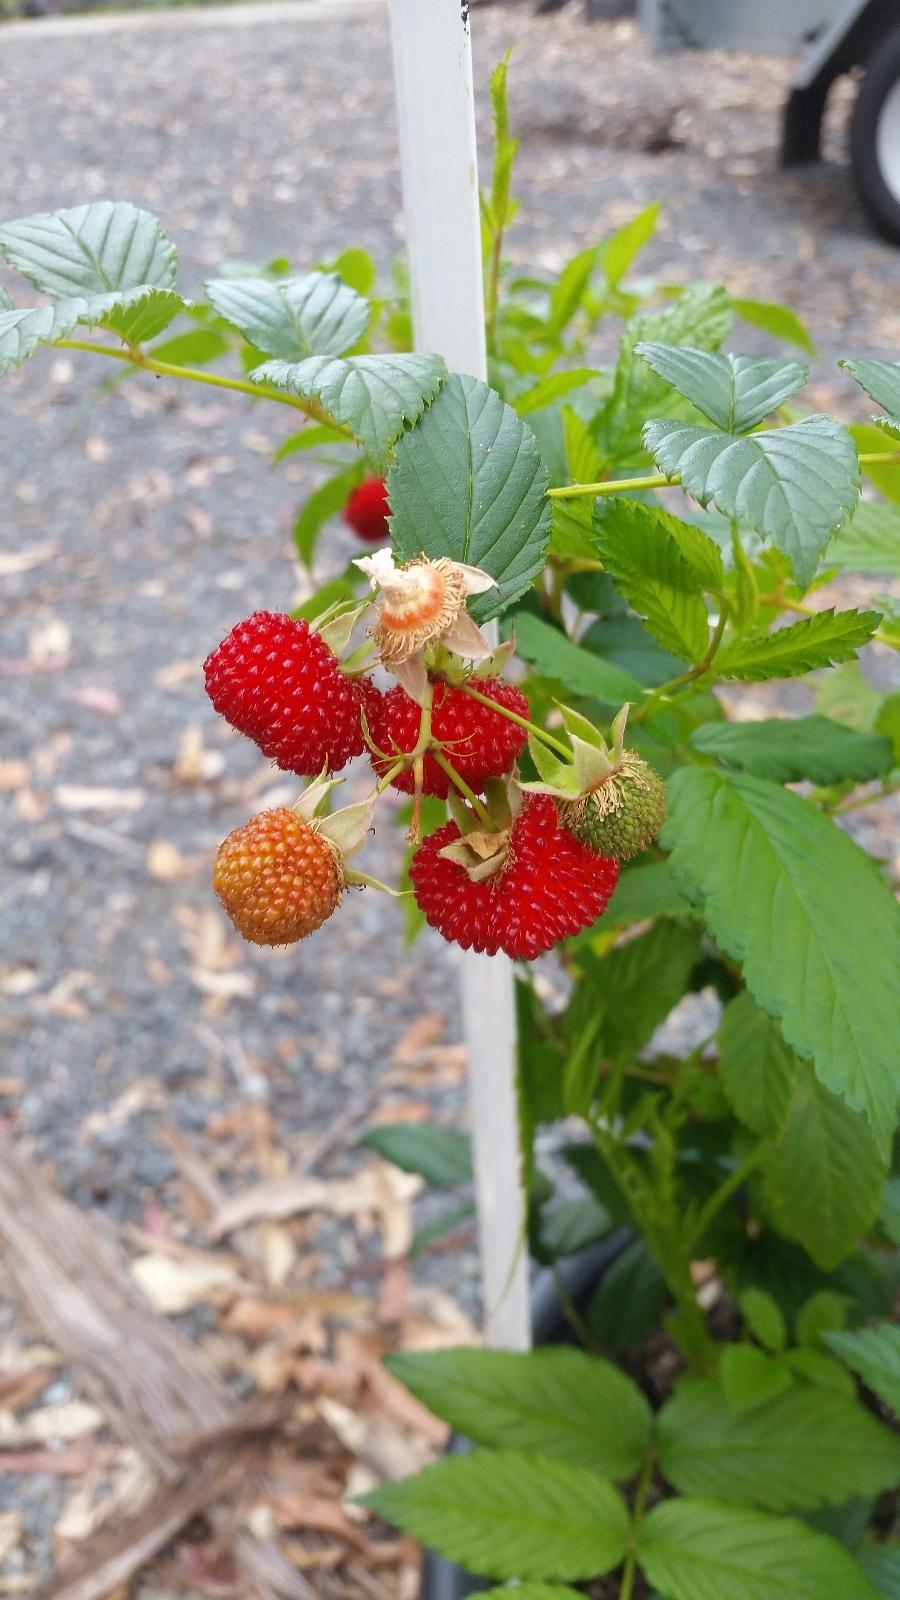 Sweet Native Raspberry - Fruit